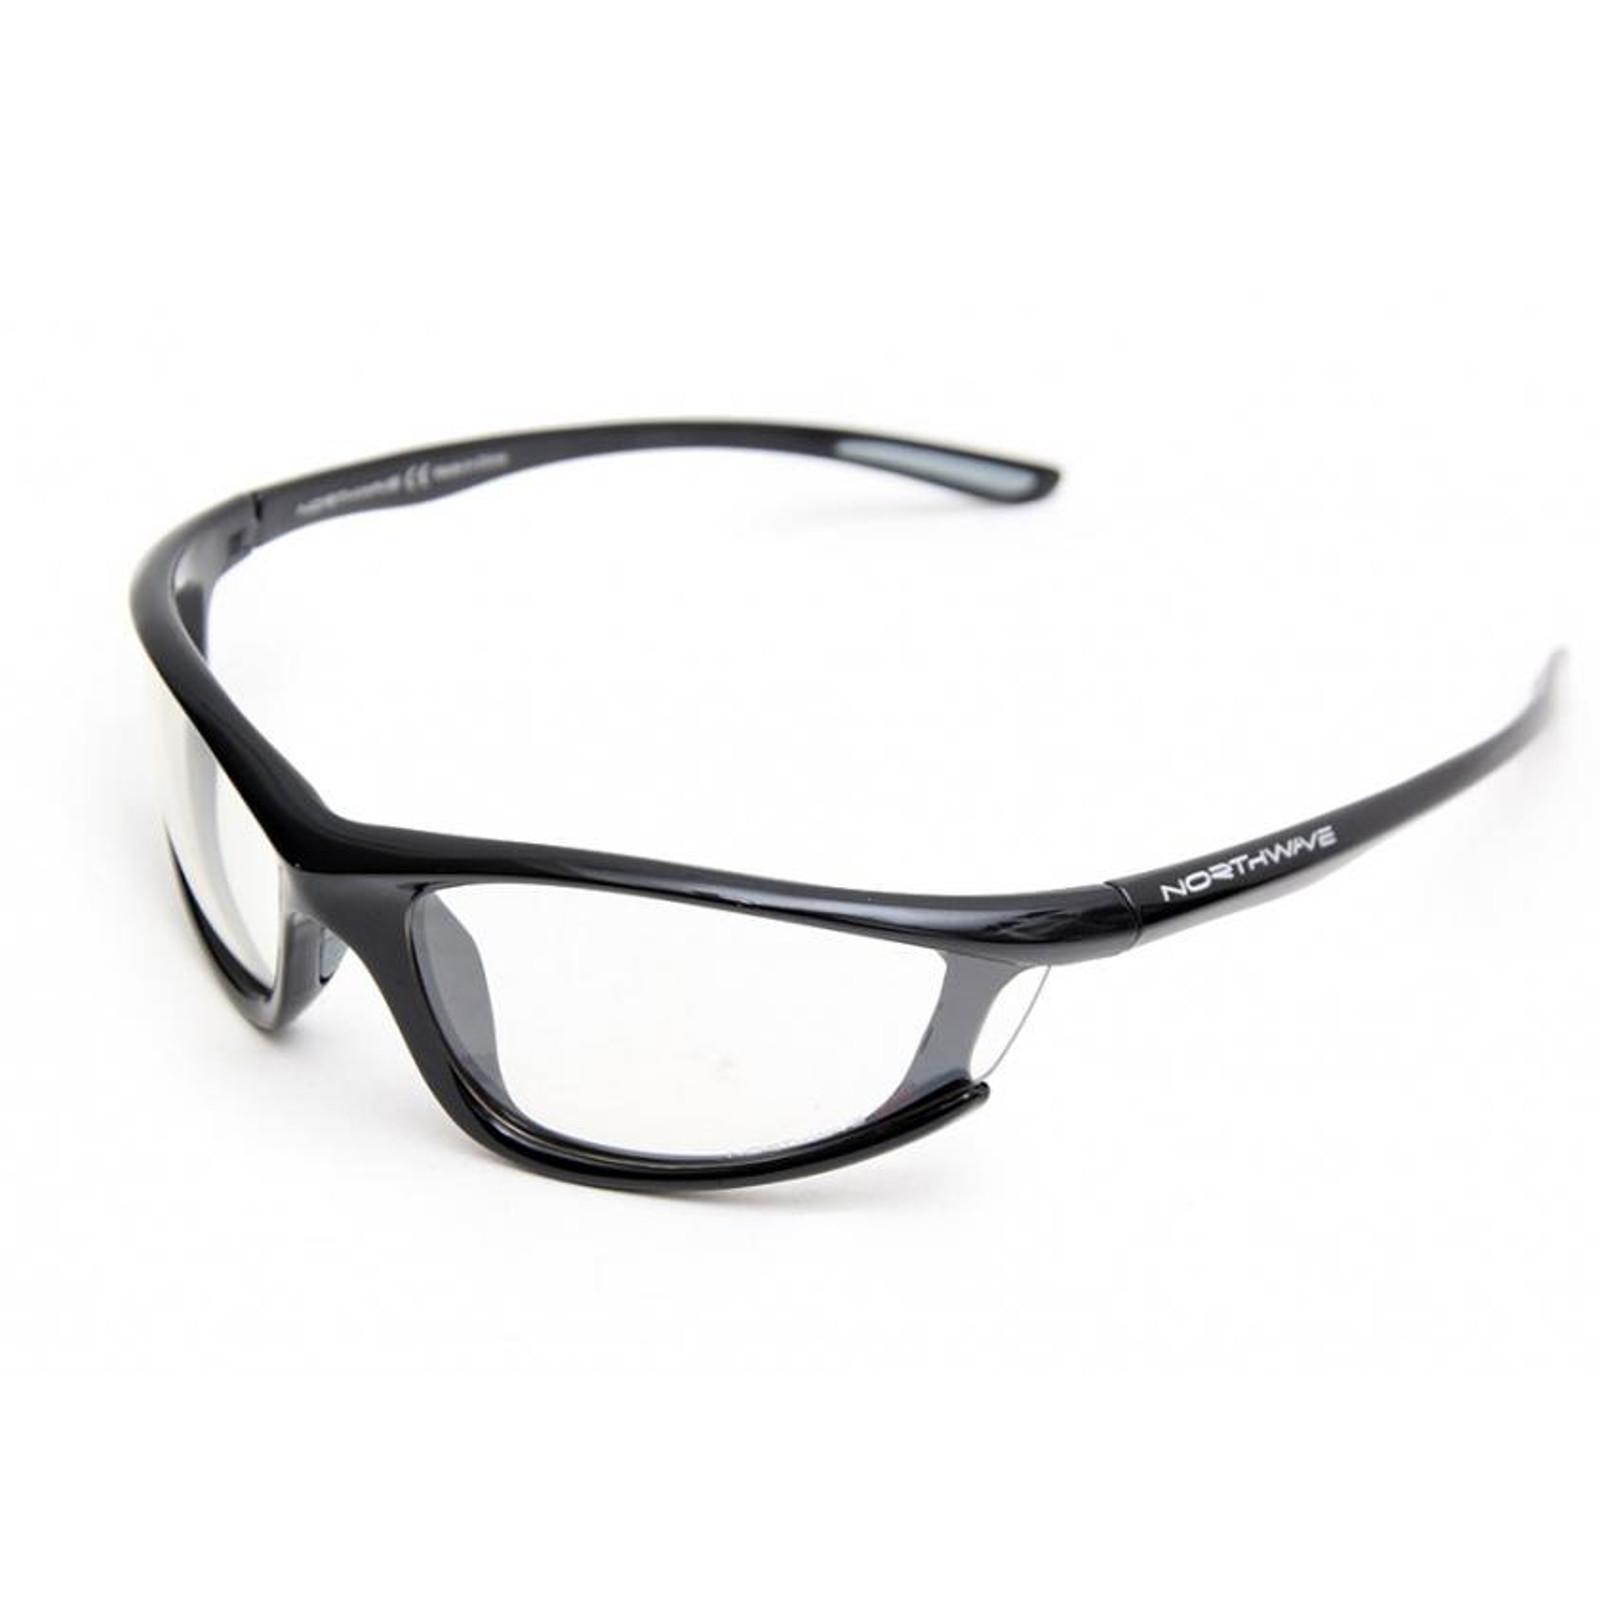 246ecd5f7cb Oakley Cycling Sunglasses Clear Lenses « Heritage Malta